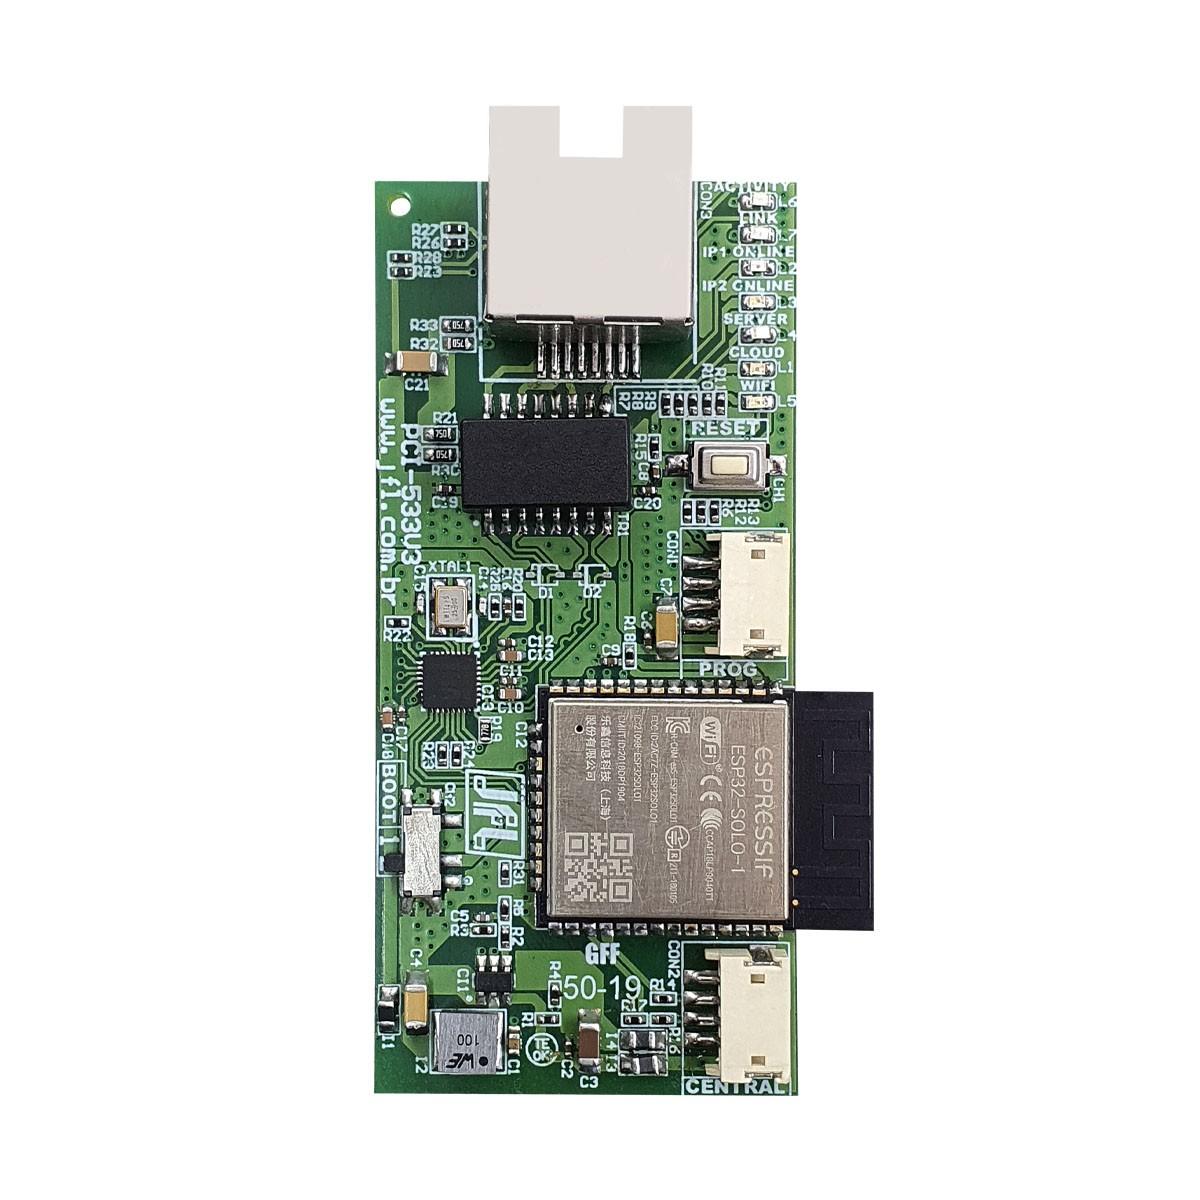 Kit Alarme Jfl Smart Cloud 18 Sensor Barramento Ds 510 Bus